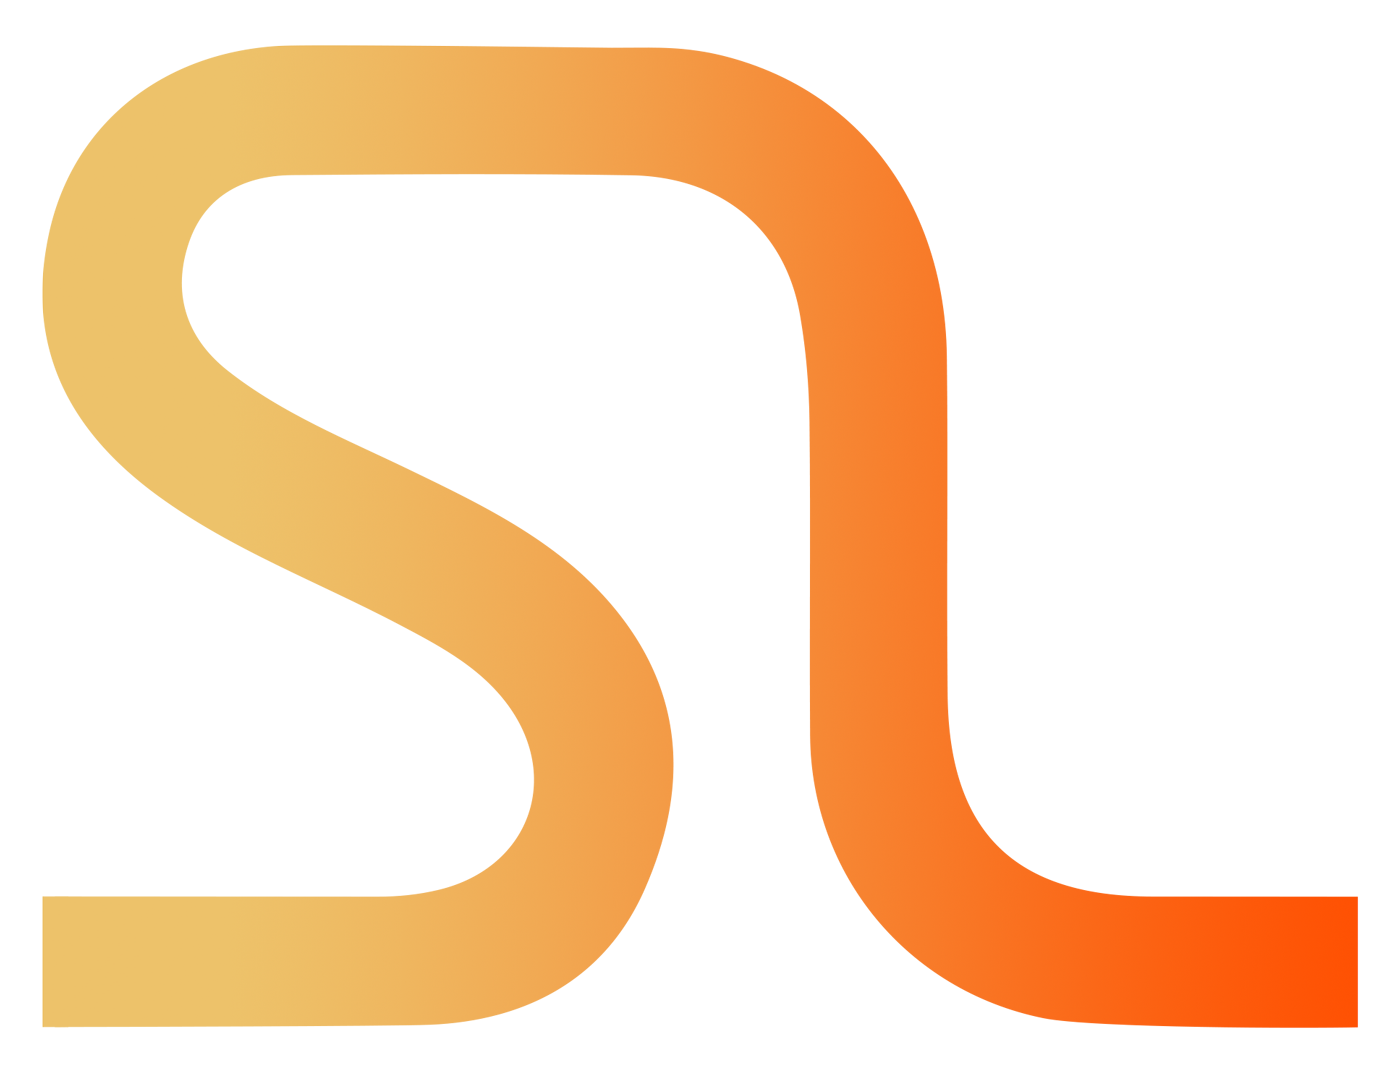 StreamLined by Streamlined Media & Communications